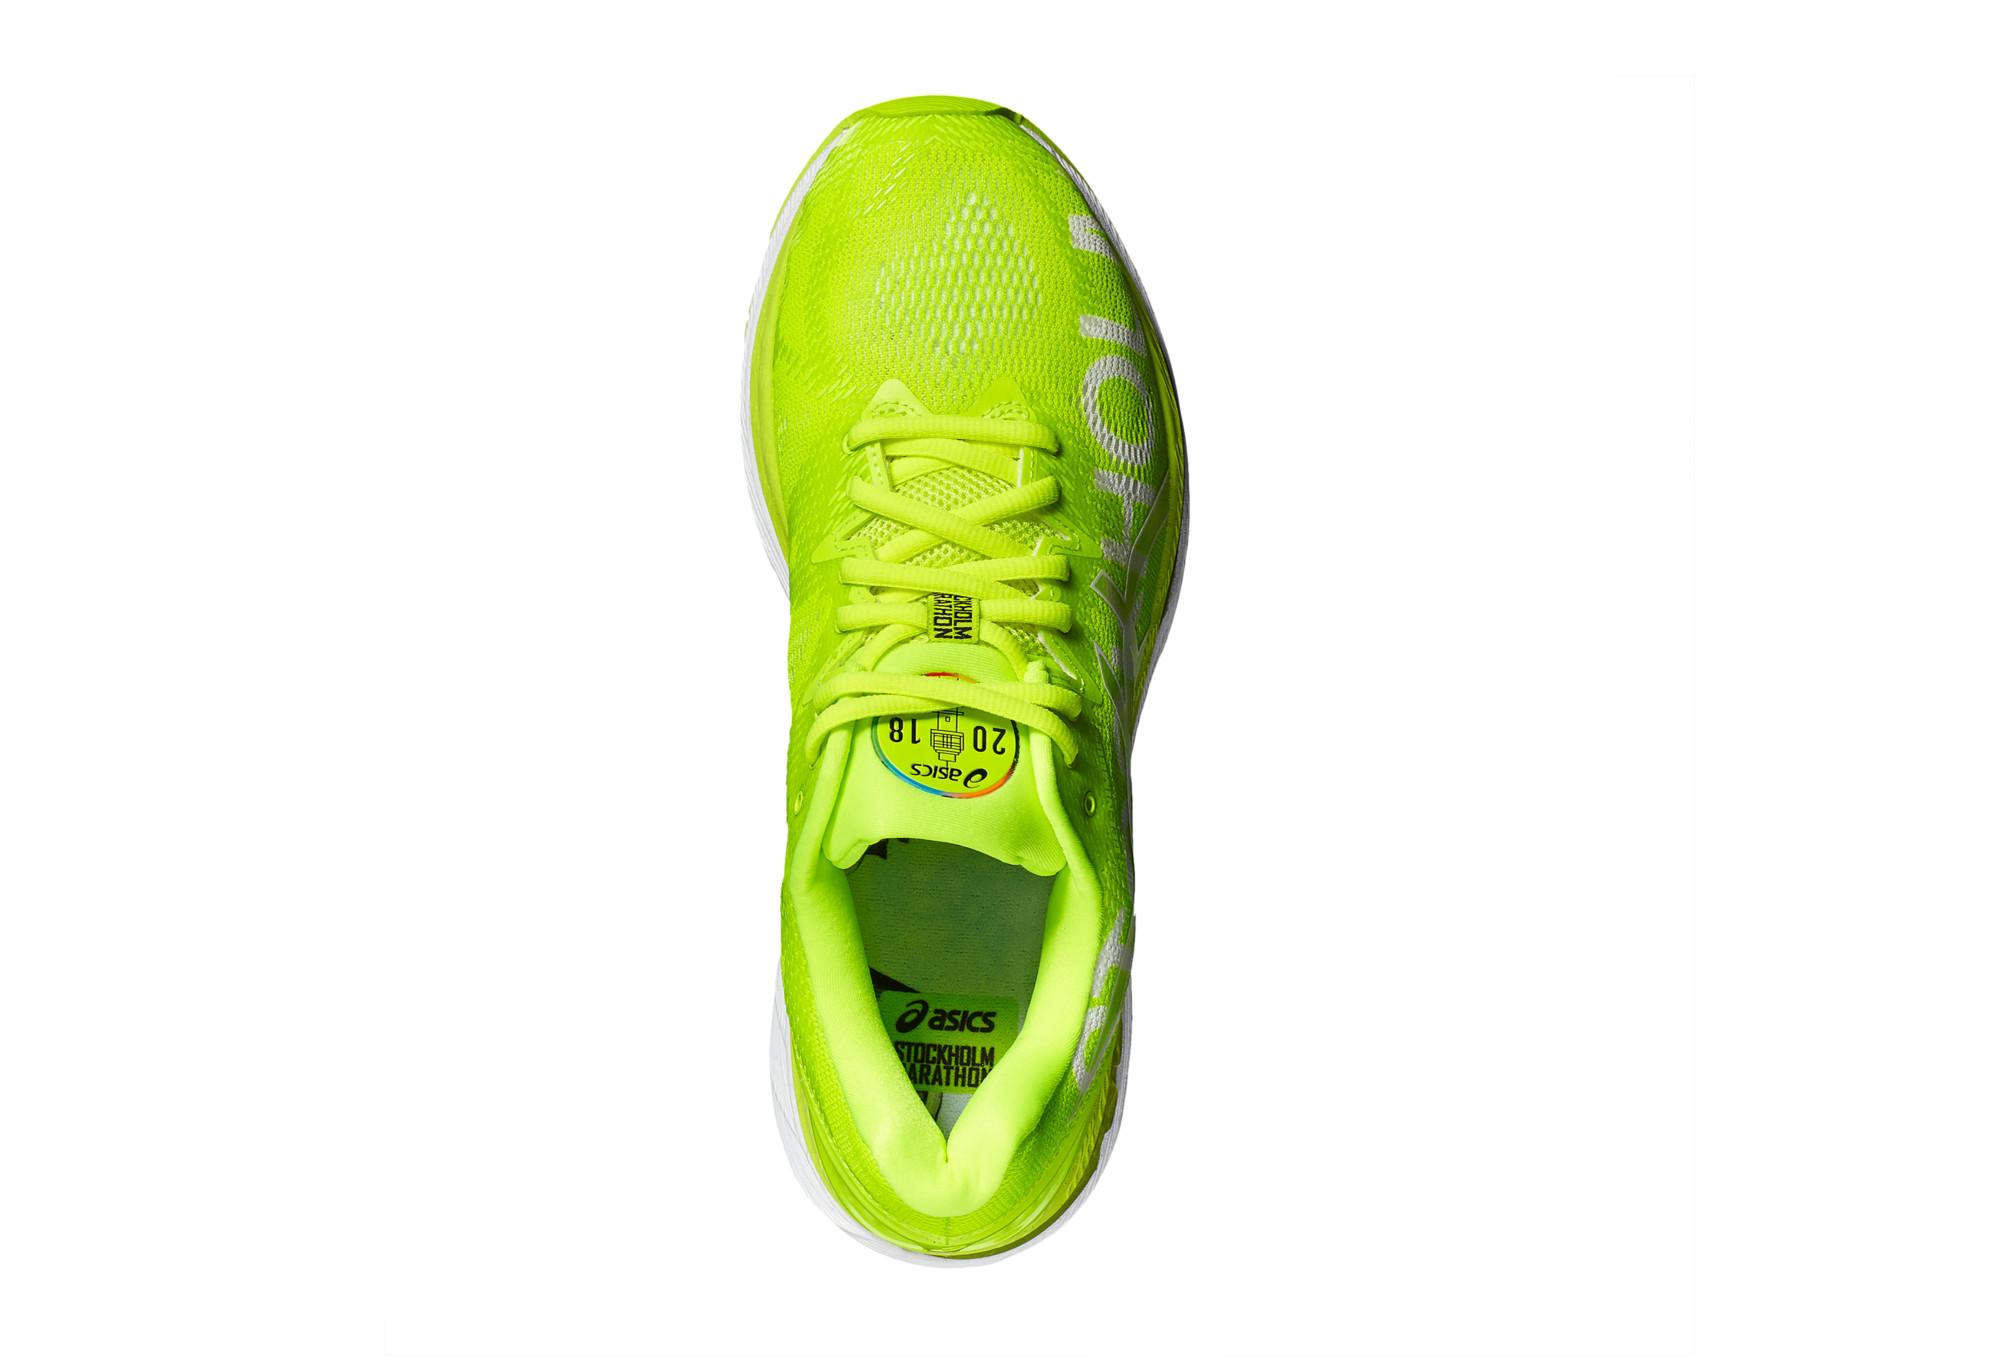 Running Nimbus Stockholm Fluo De Asics Marathon Chaussures 20 Gel Jaune yNnwv0Om8